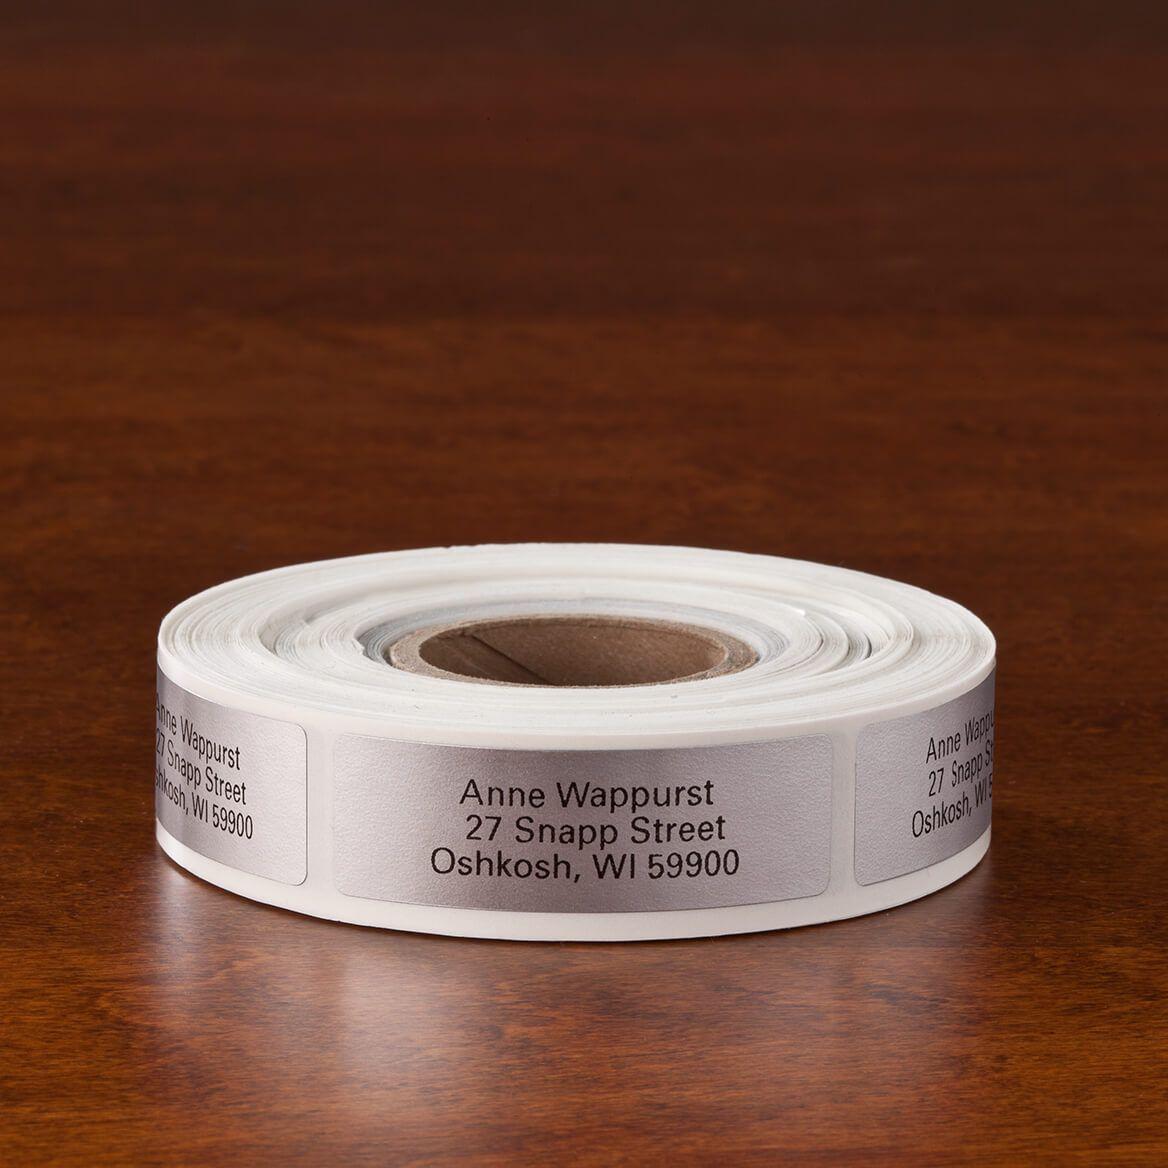 Self Stick Address Labels - Roll of 500-310880